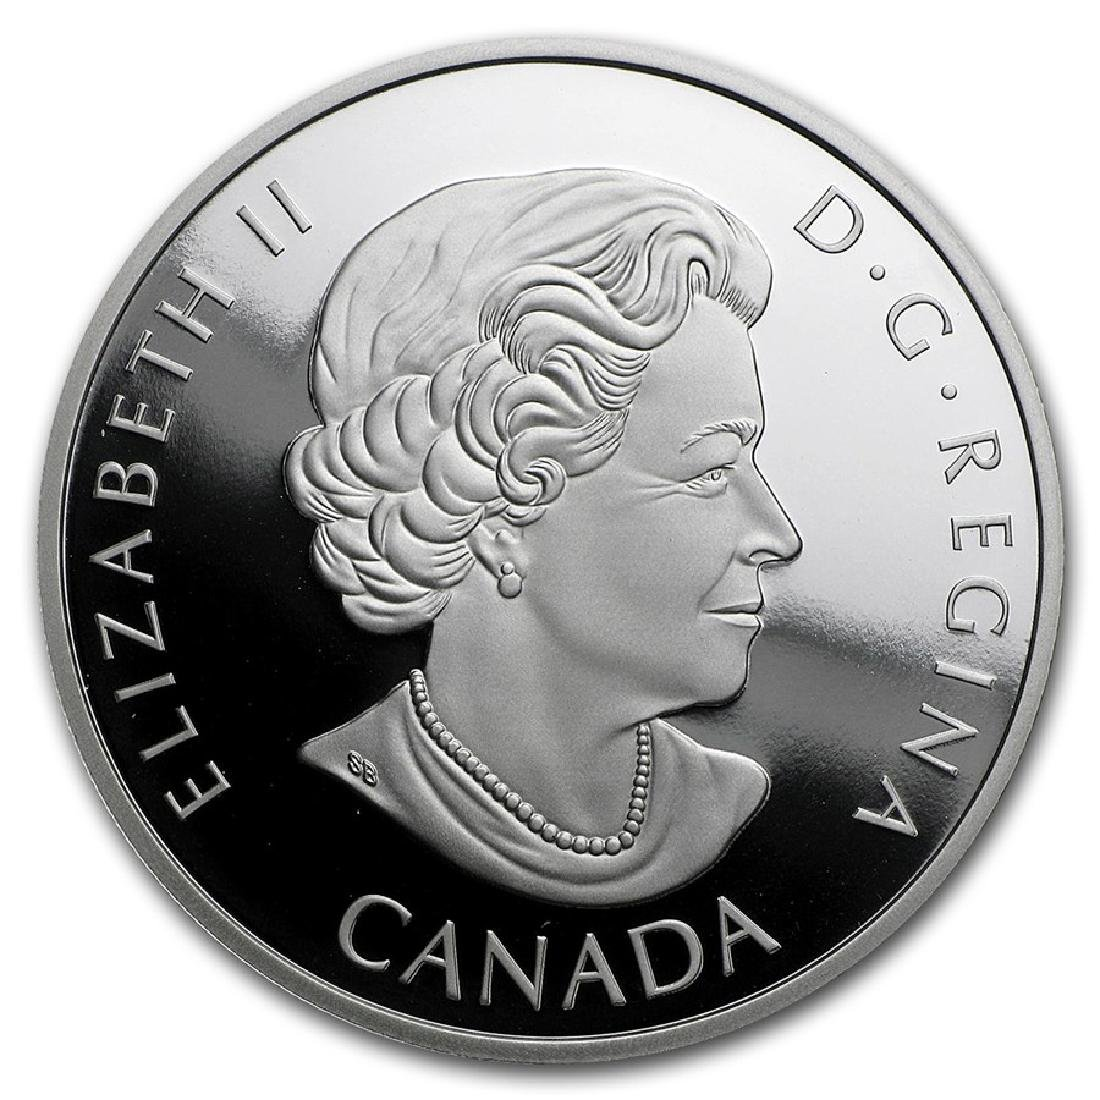 2016 $20 Canada Man of Steel 1 oz Silver Coin - 2